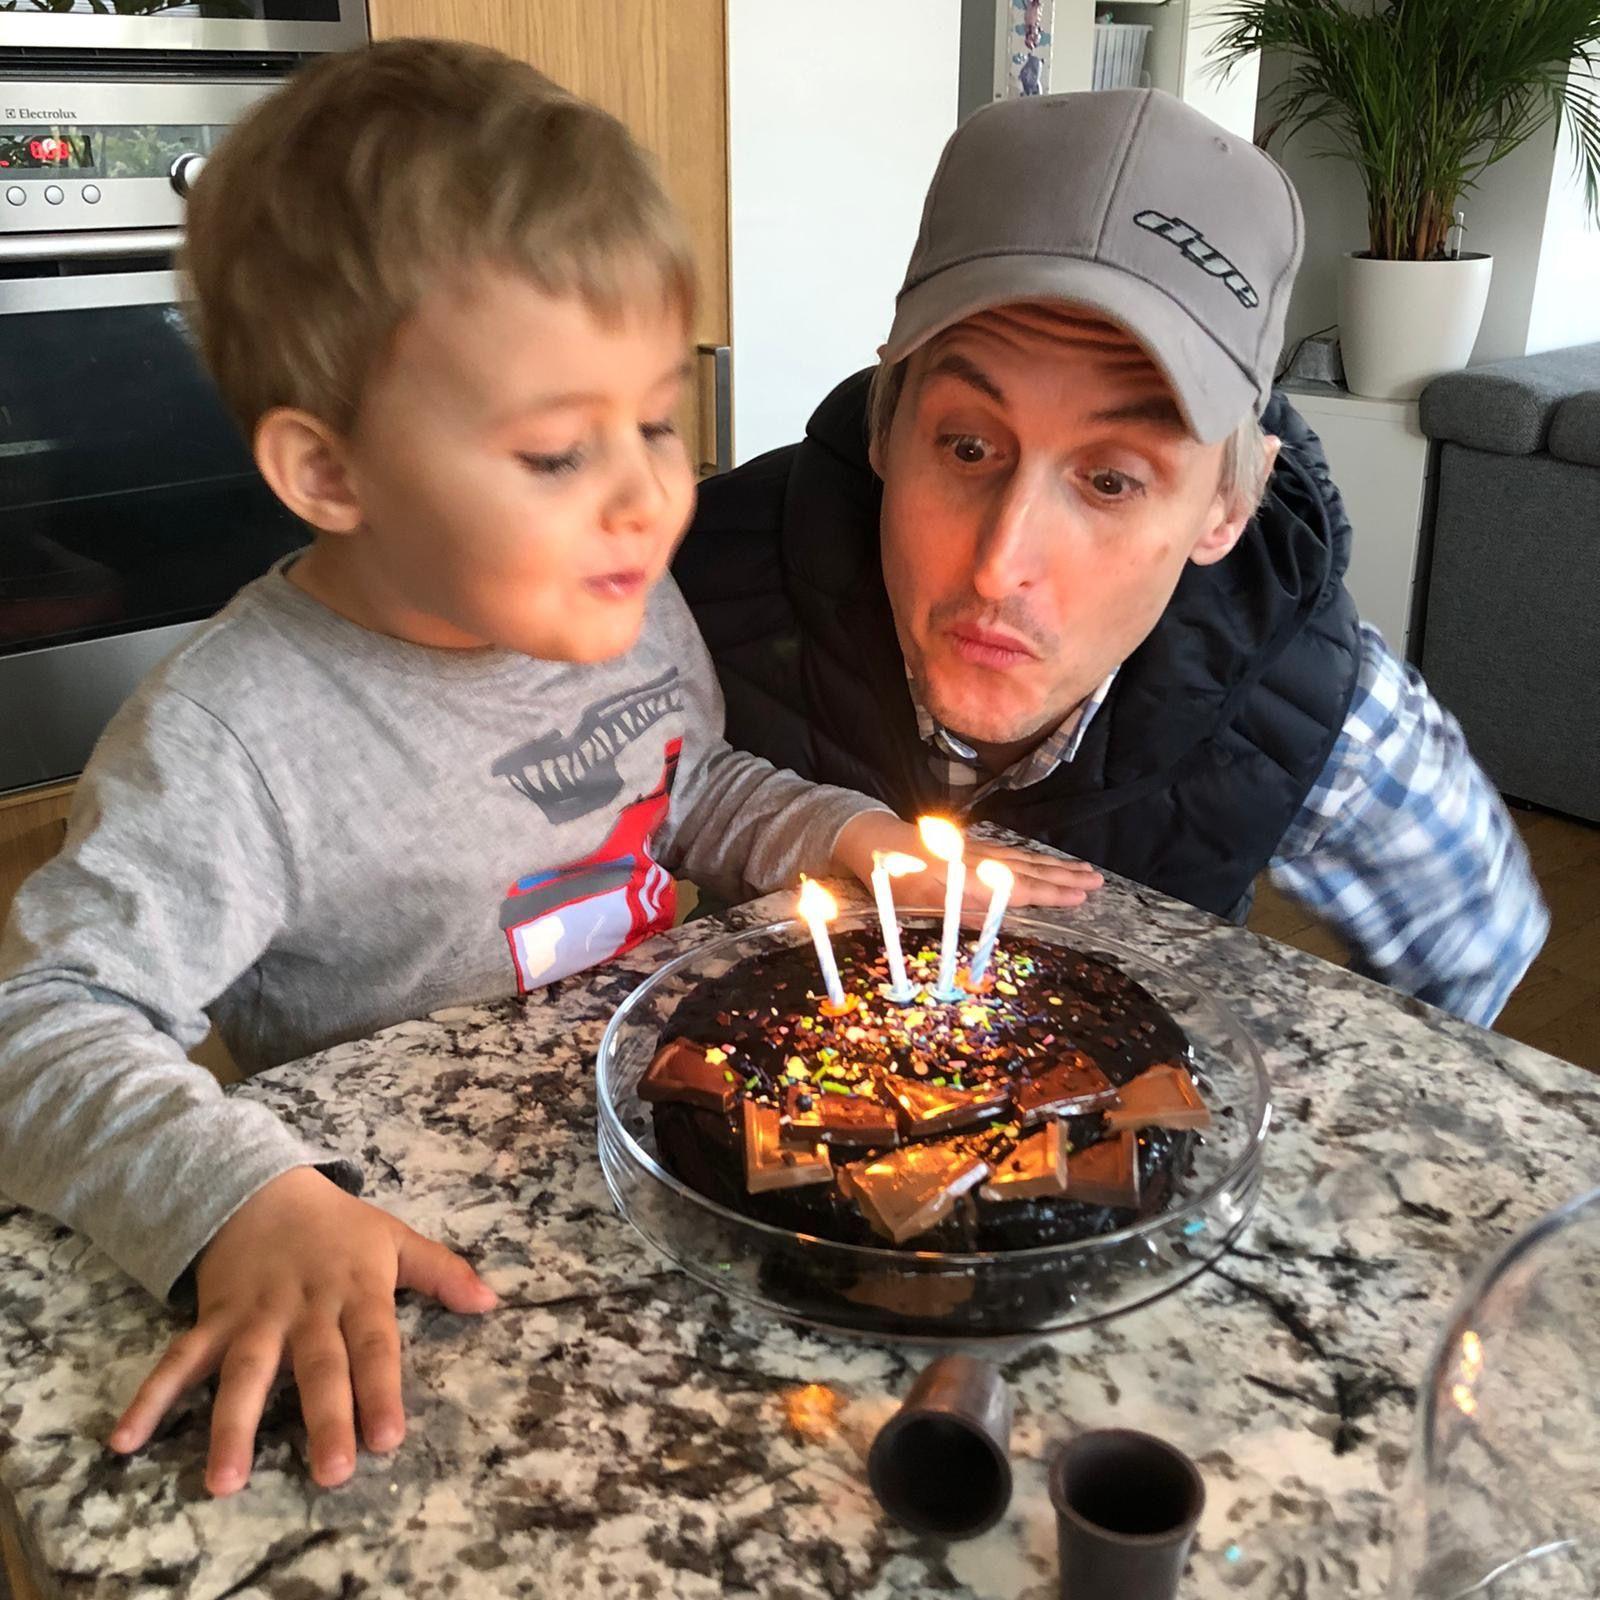 #199 It's my birthday (ft. Frantz Puchert)